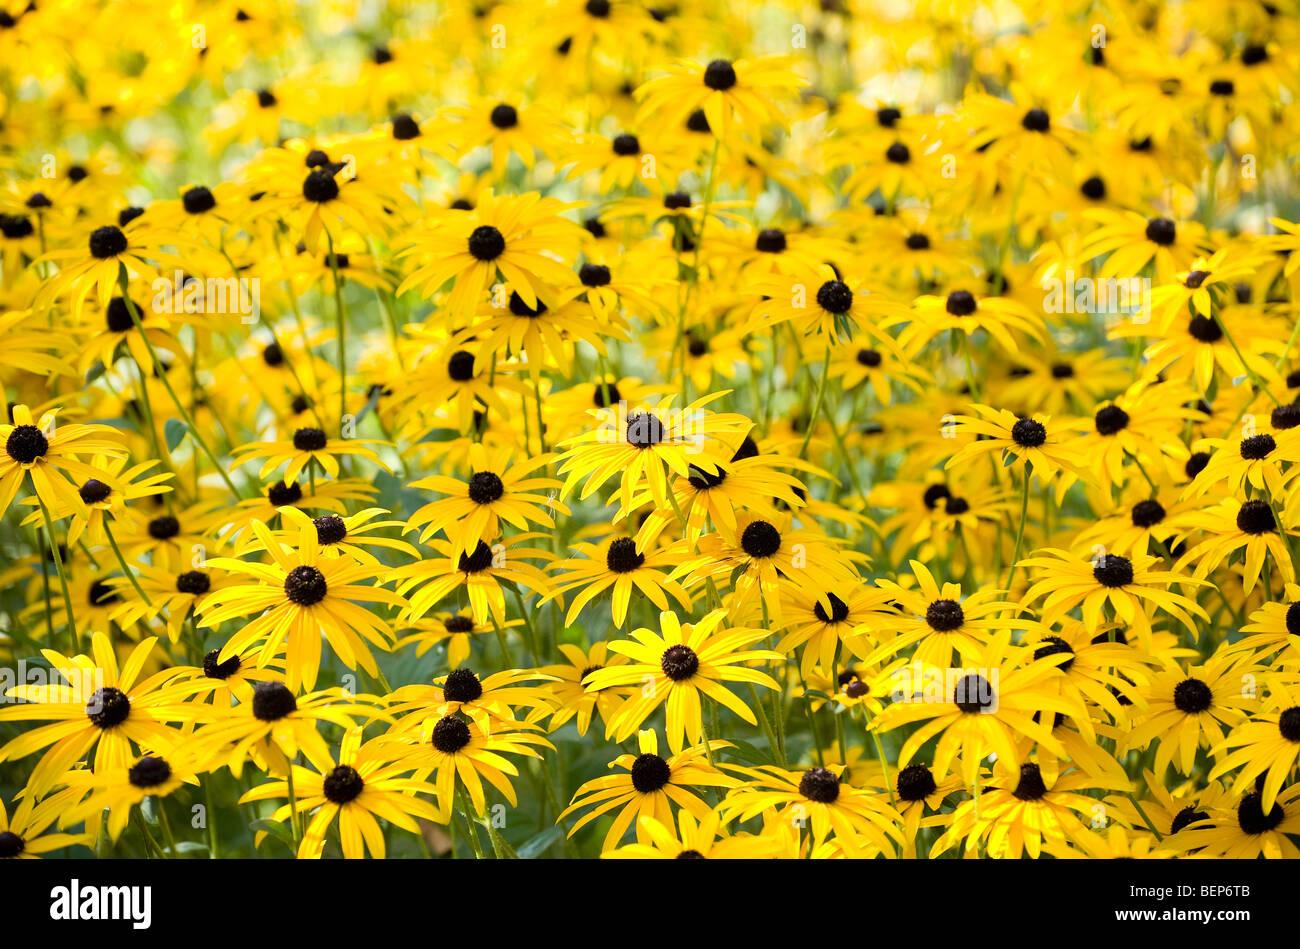 black eyed susan flowers in english cottage garden - Stock Image